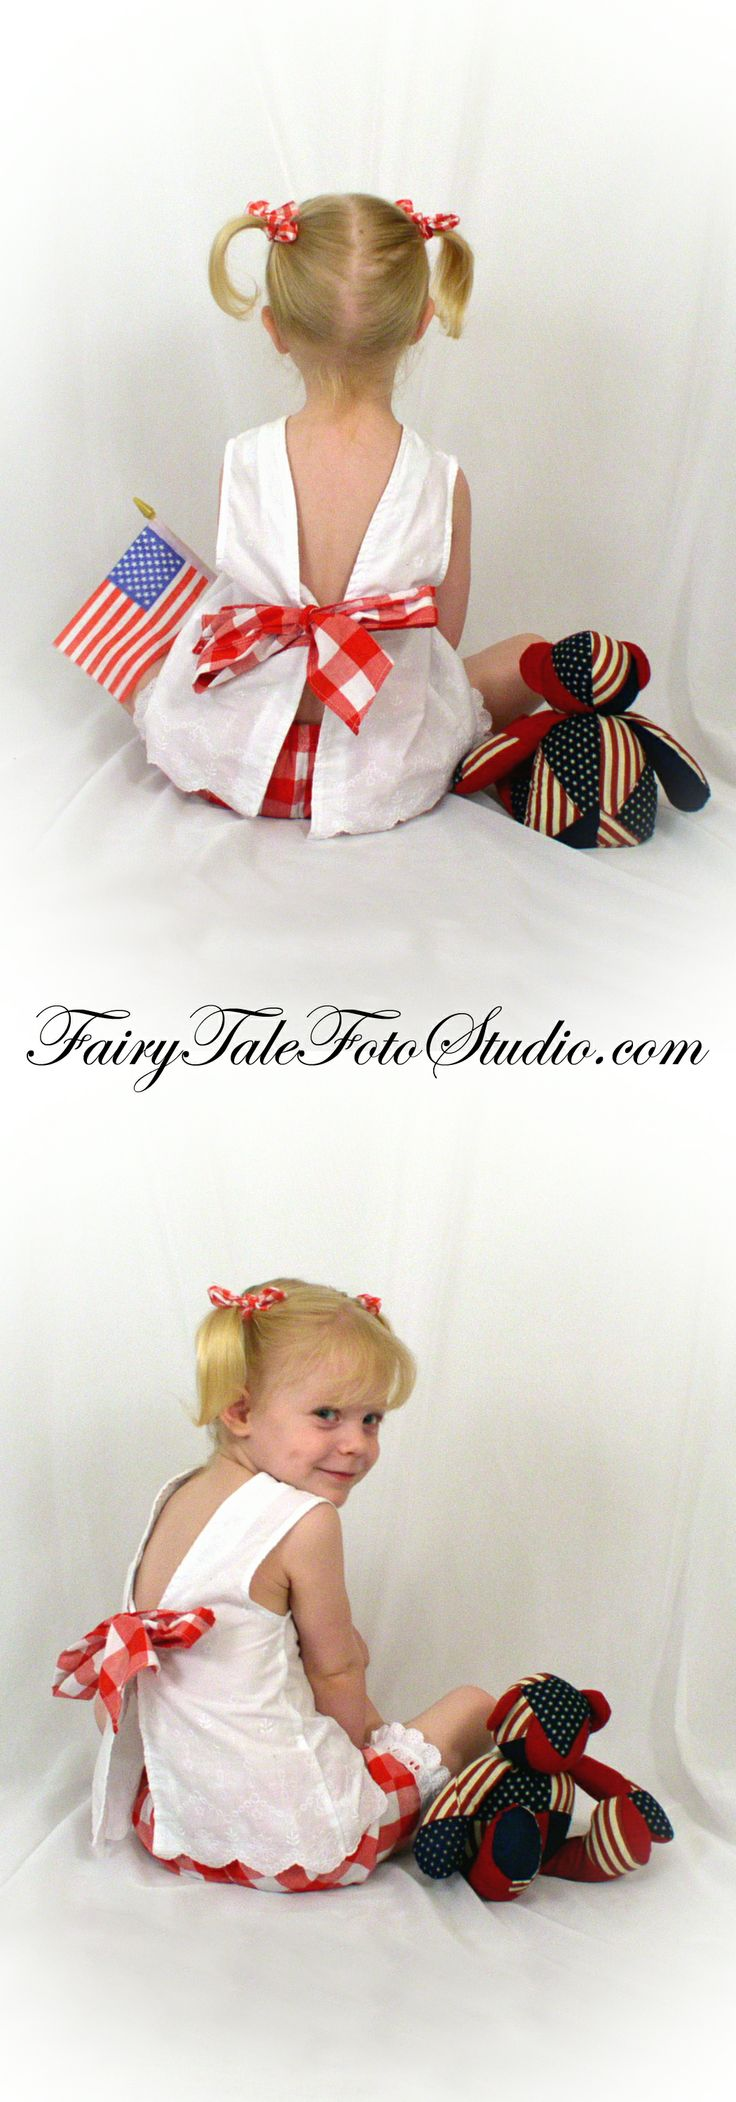 4th of July | Independence Day | Patriotic | Flag | Americana | America | U.S.A. | USA | Girl | Portrait | Portrait Poses | Photo Idea | Photography | Cute Kid Pic | Baby Pics | Posing Ideas | Kids | Children | Child | ~Bountiful Utah Photographer close to Salt Lake City | Ogden | Provo UT~